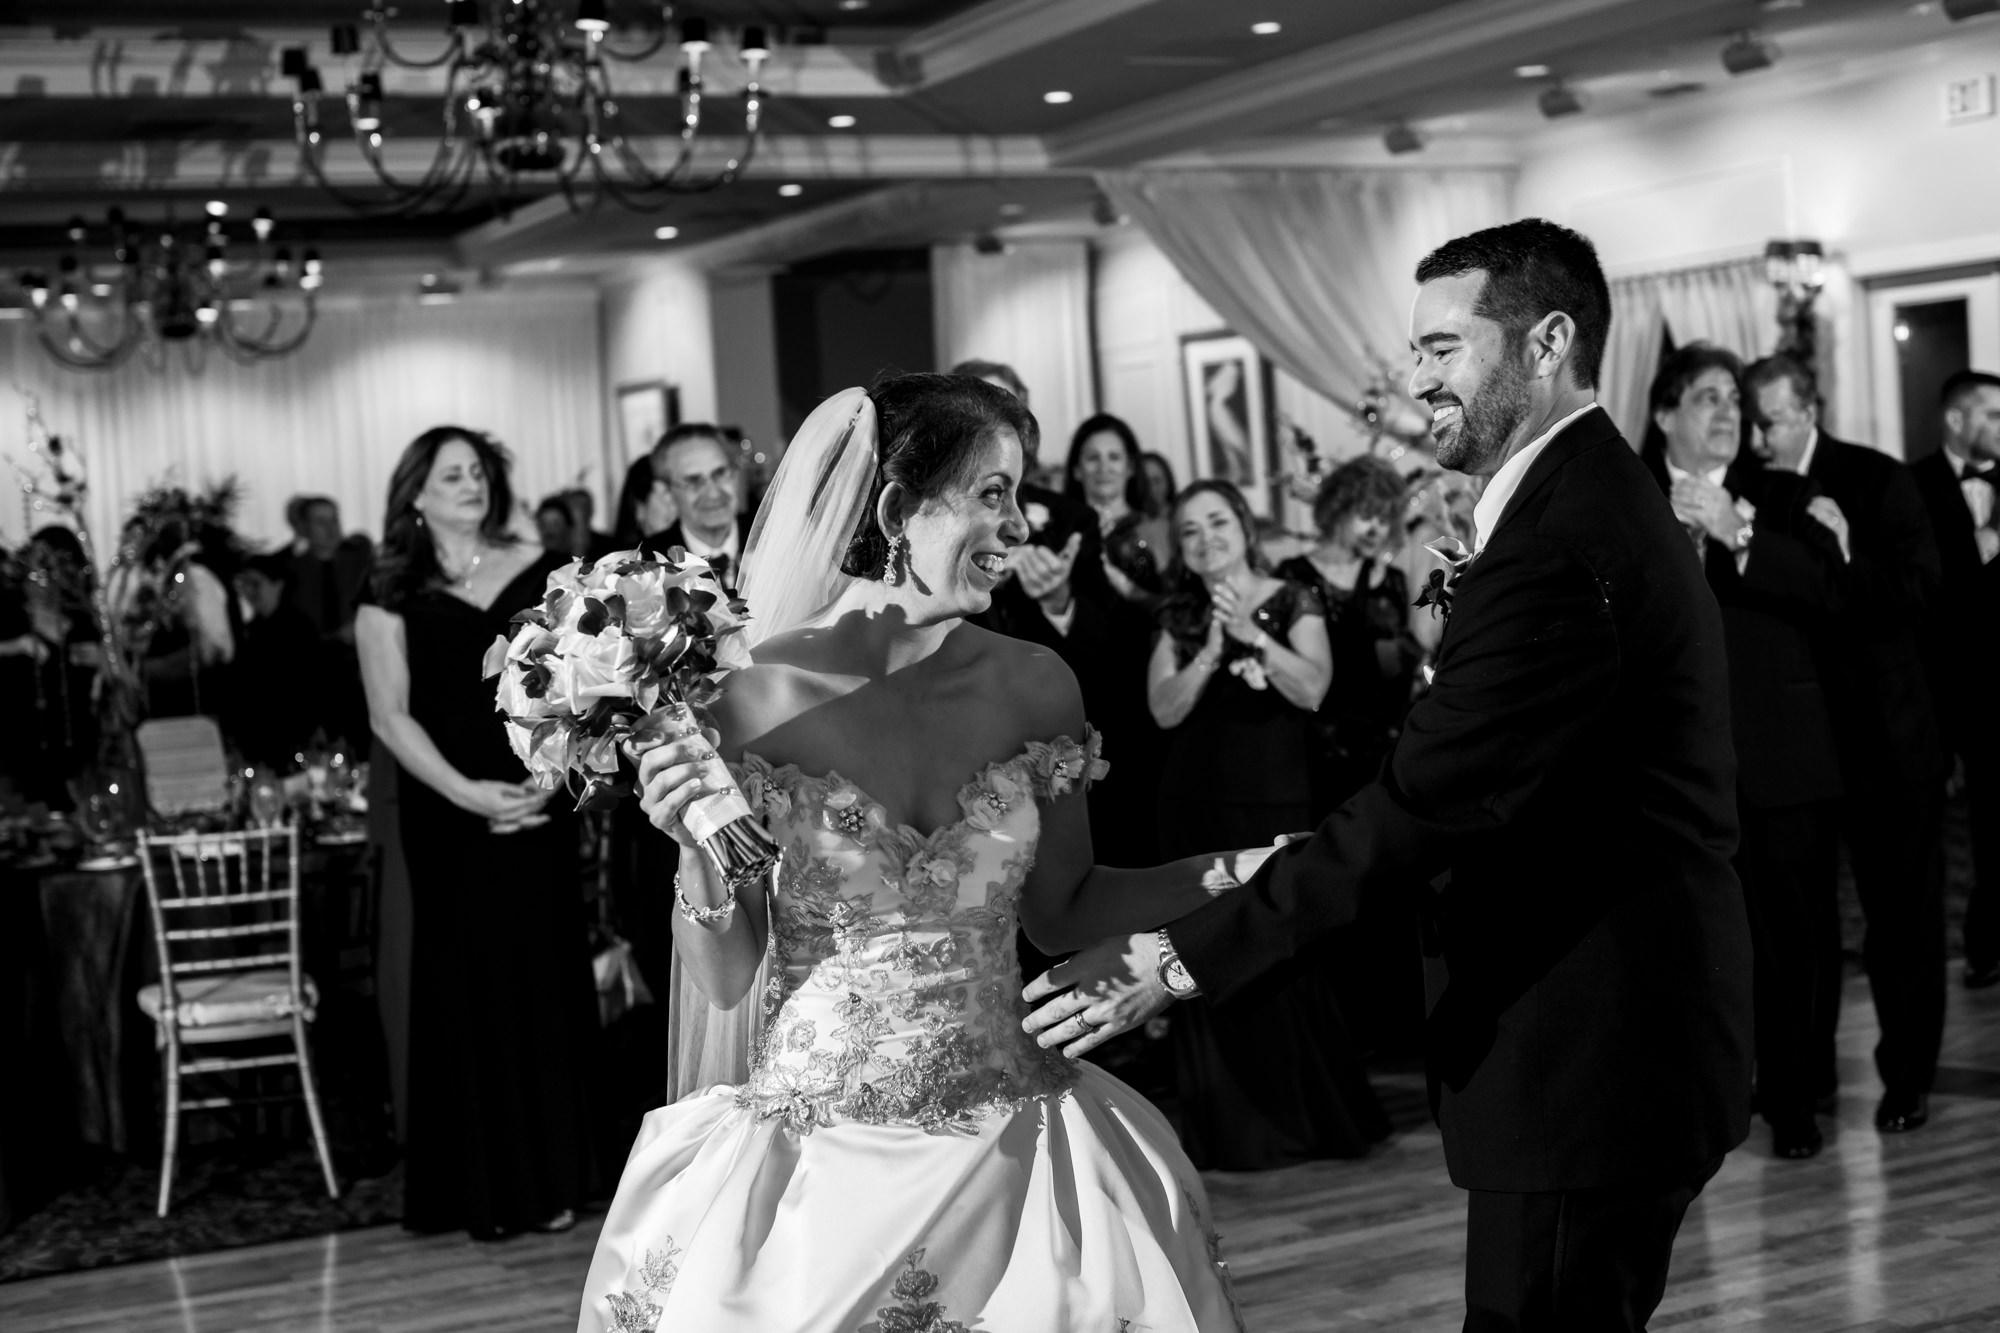 Benvenuto_Wedding_catholic_Florida_Bride-Groom-107.jpg